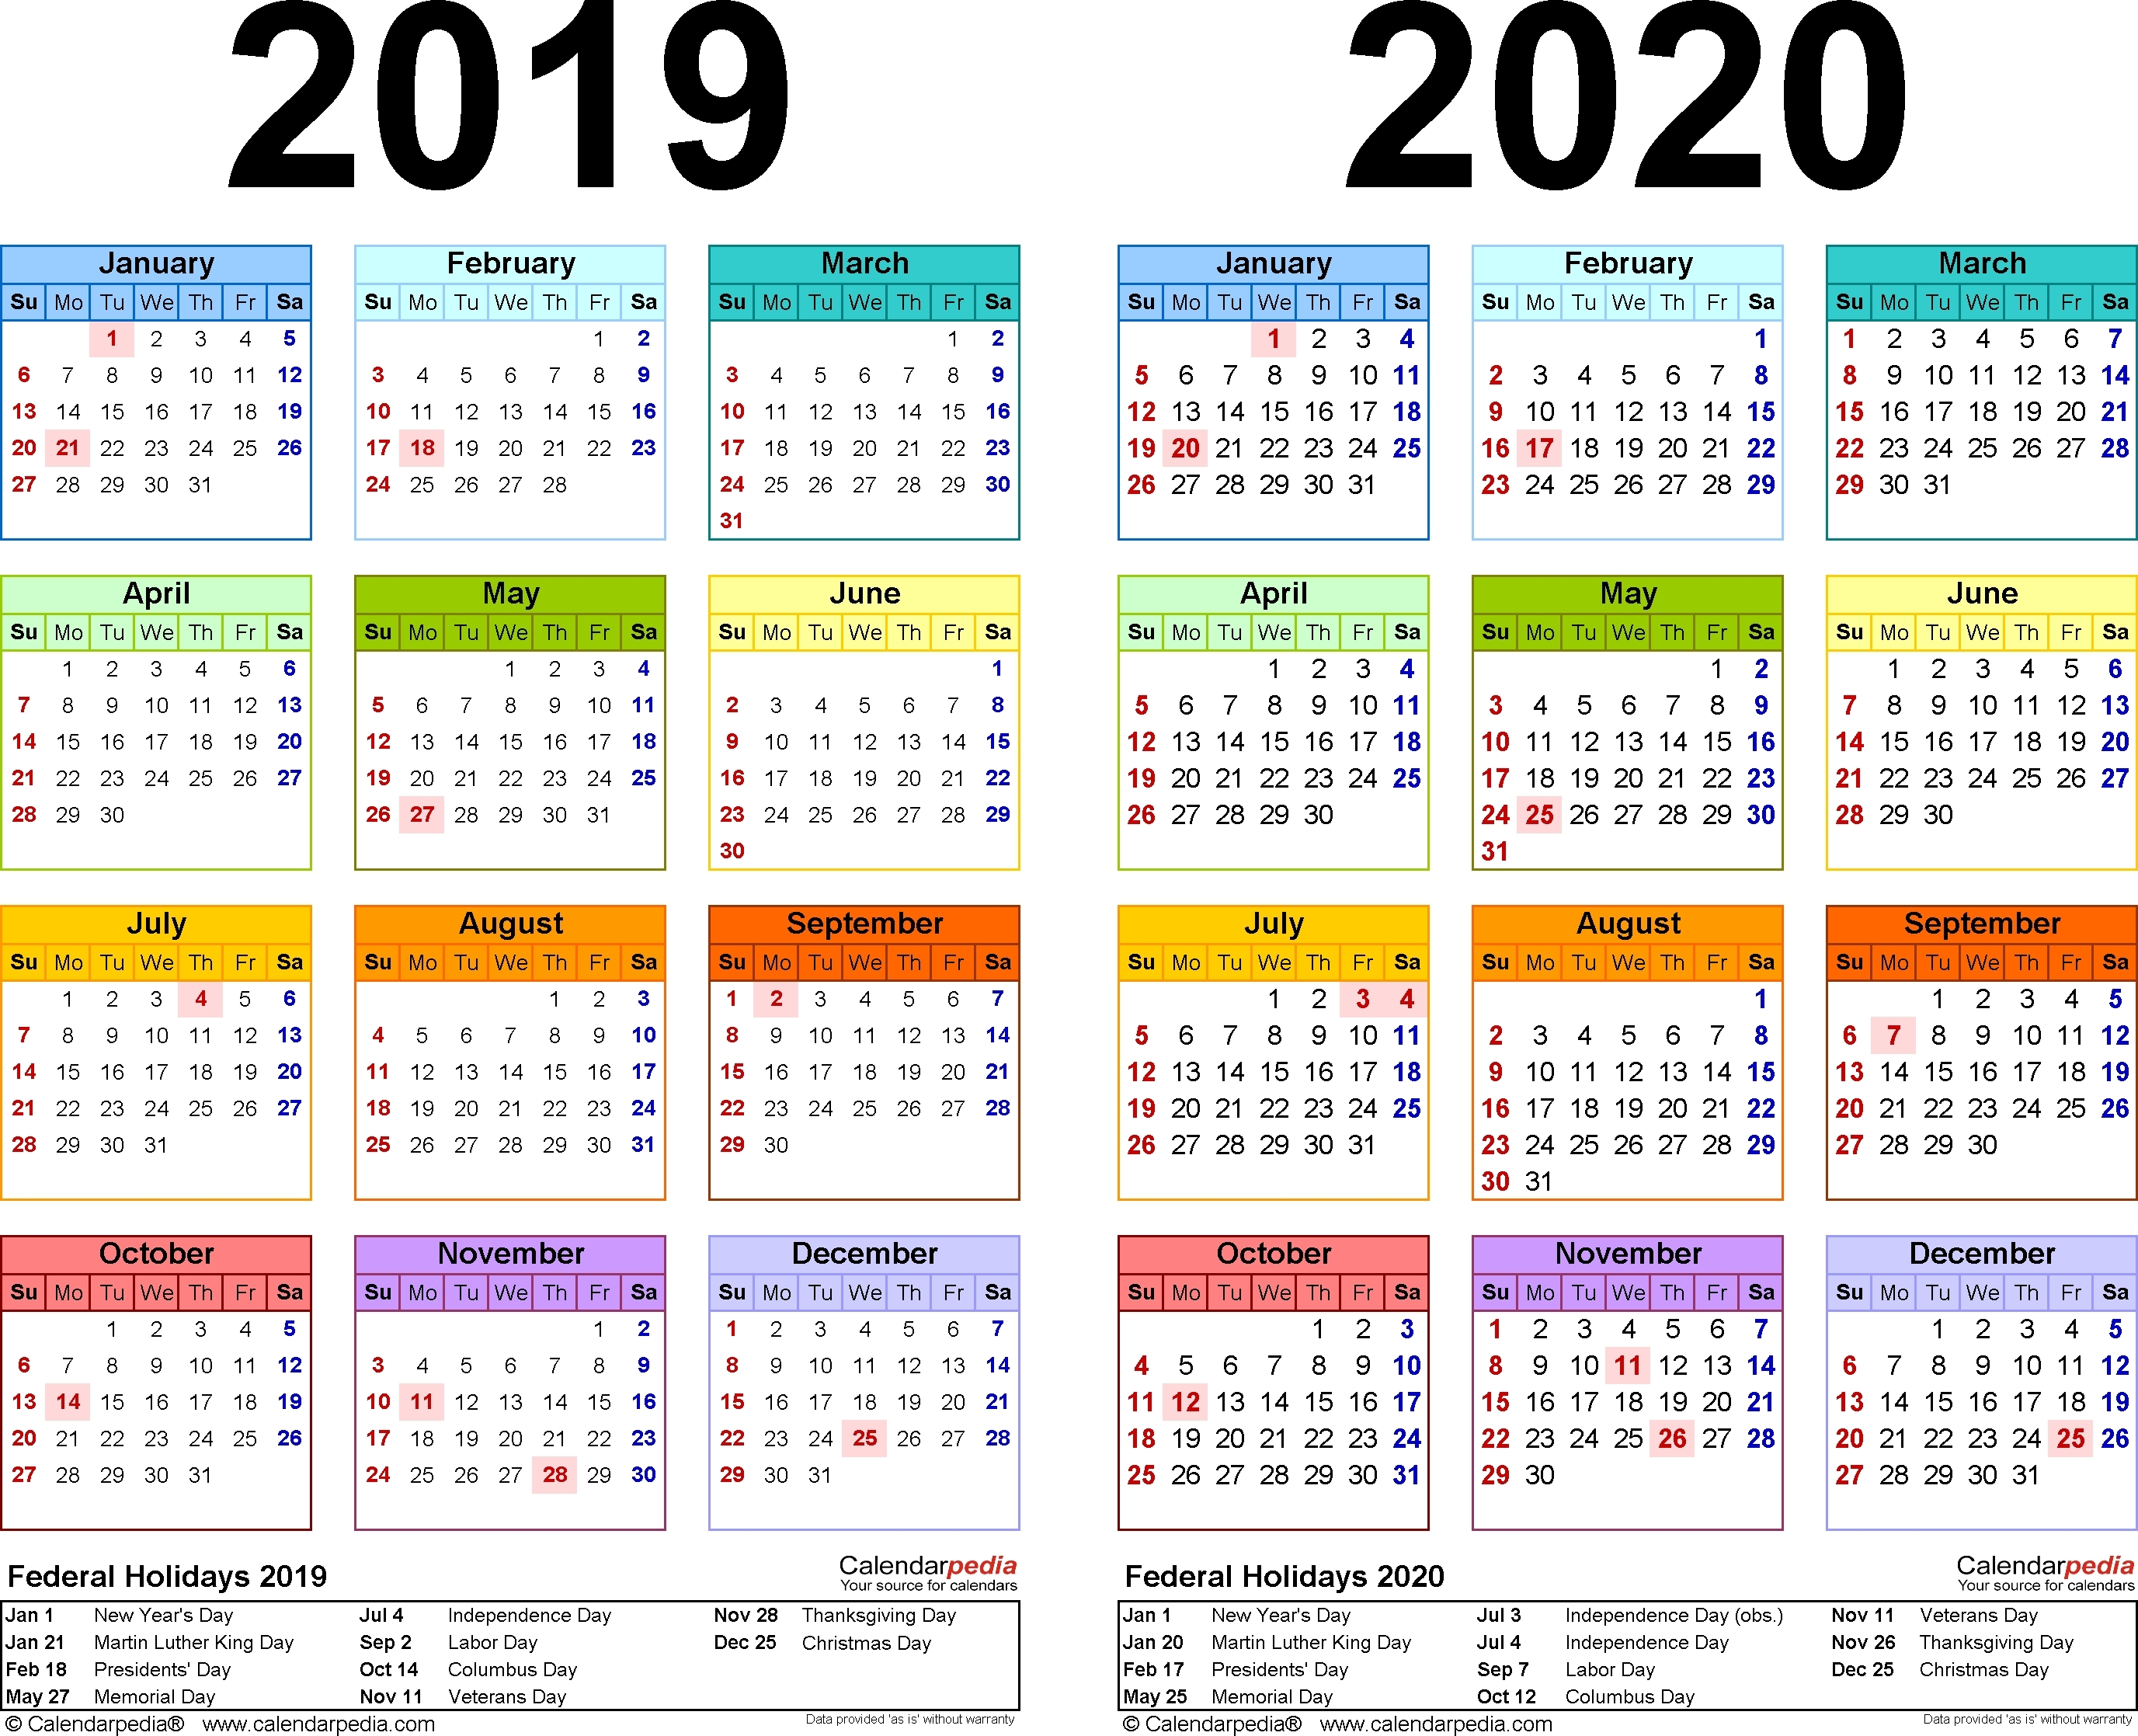 2020 18 School Calendar Template | Free Calendar Template